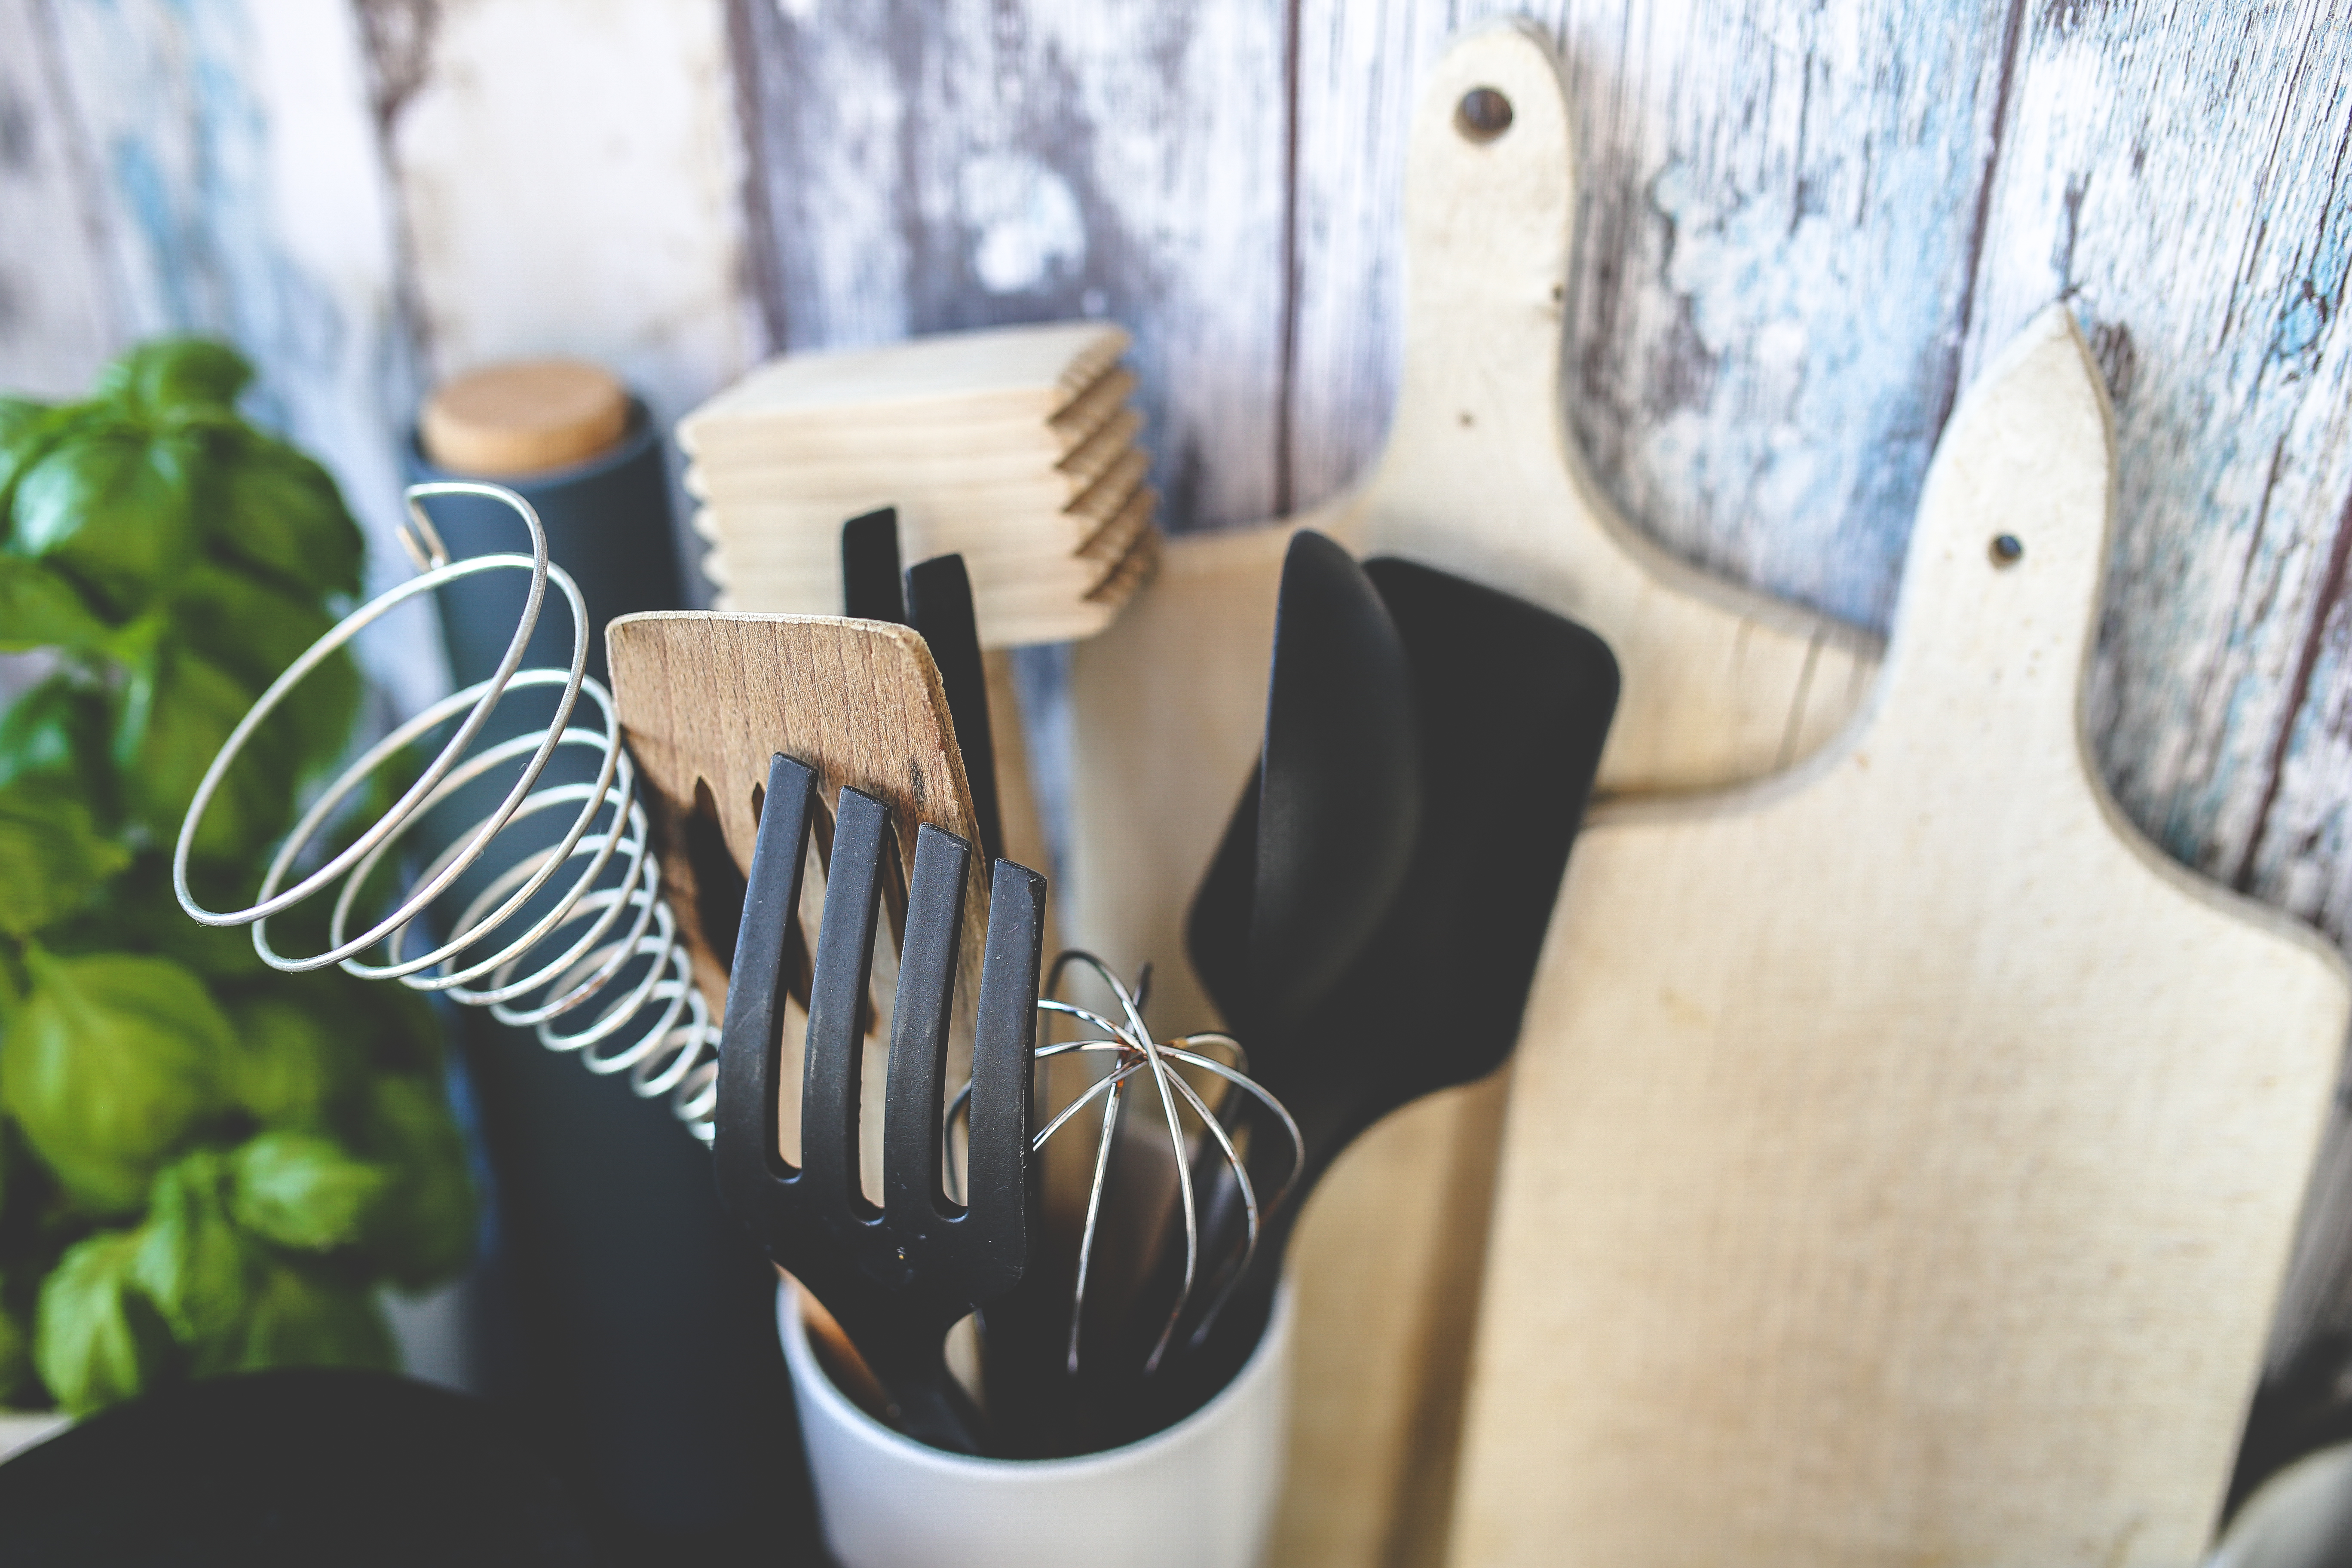 Kitchenware 183 Free Stock Photo